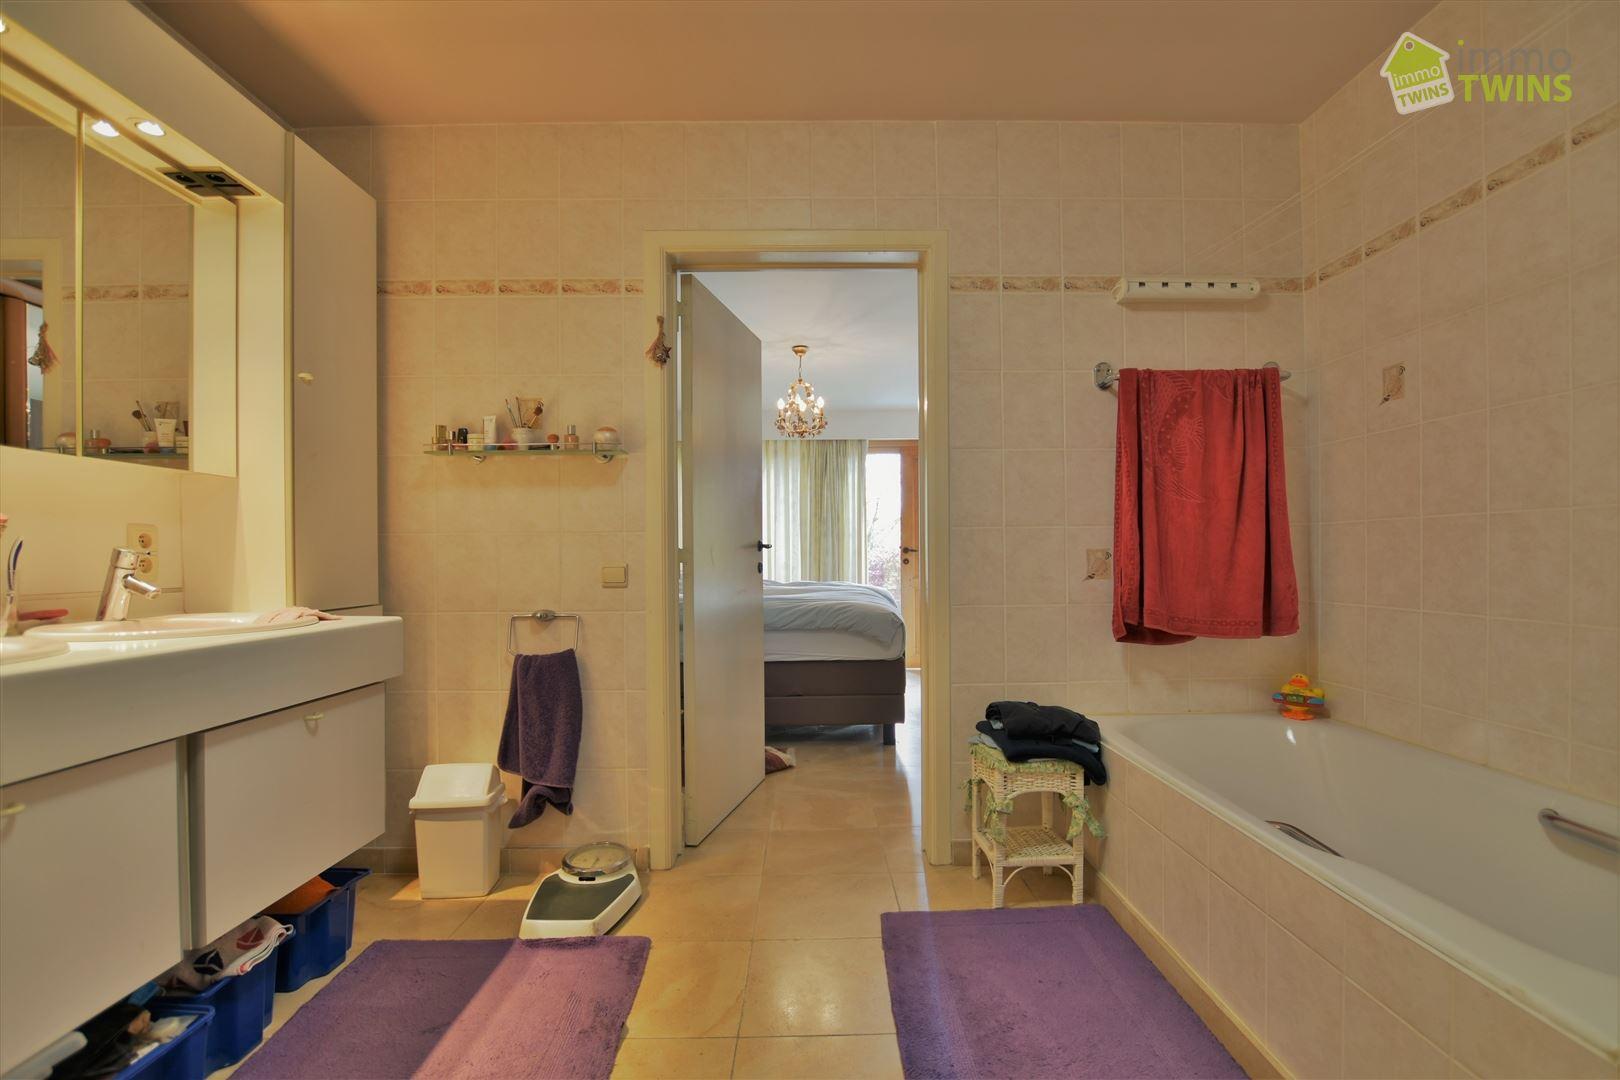 Foto 19 : Duplex/triplex te 9200 Dendermonde (België) - Prijs € 398.000